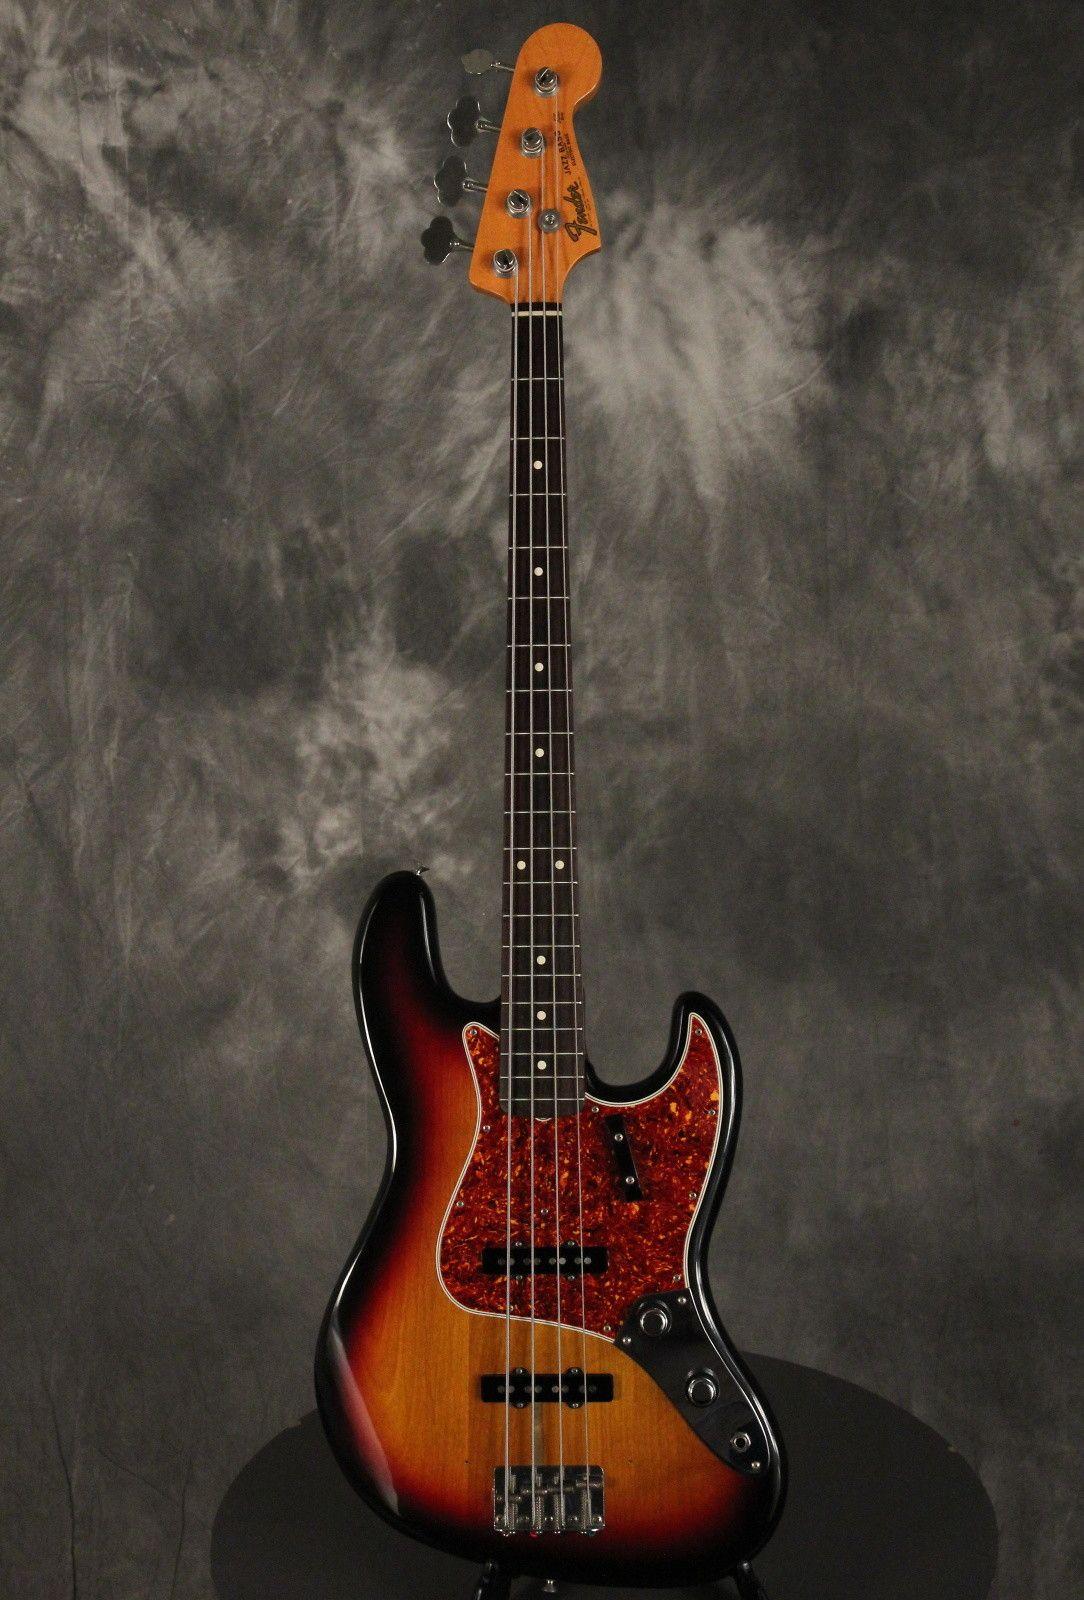 My eb bass squier vintage modified jazz bass - Fender Fullerton 1962 Jazz Bass Reissue Stack Knob W Papers 1983 Sunburst Reverb